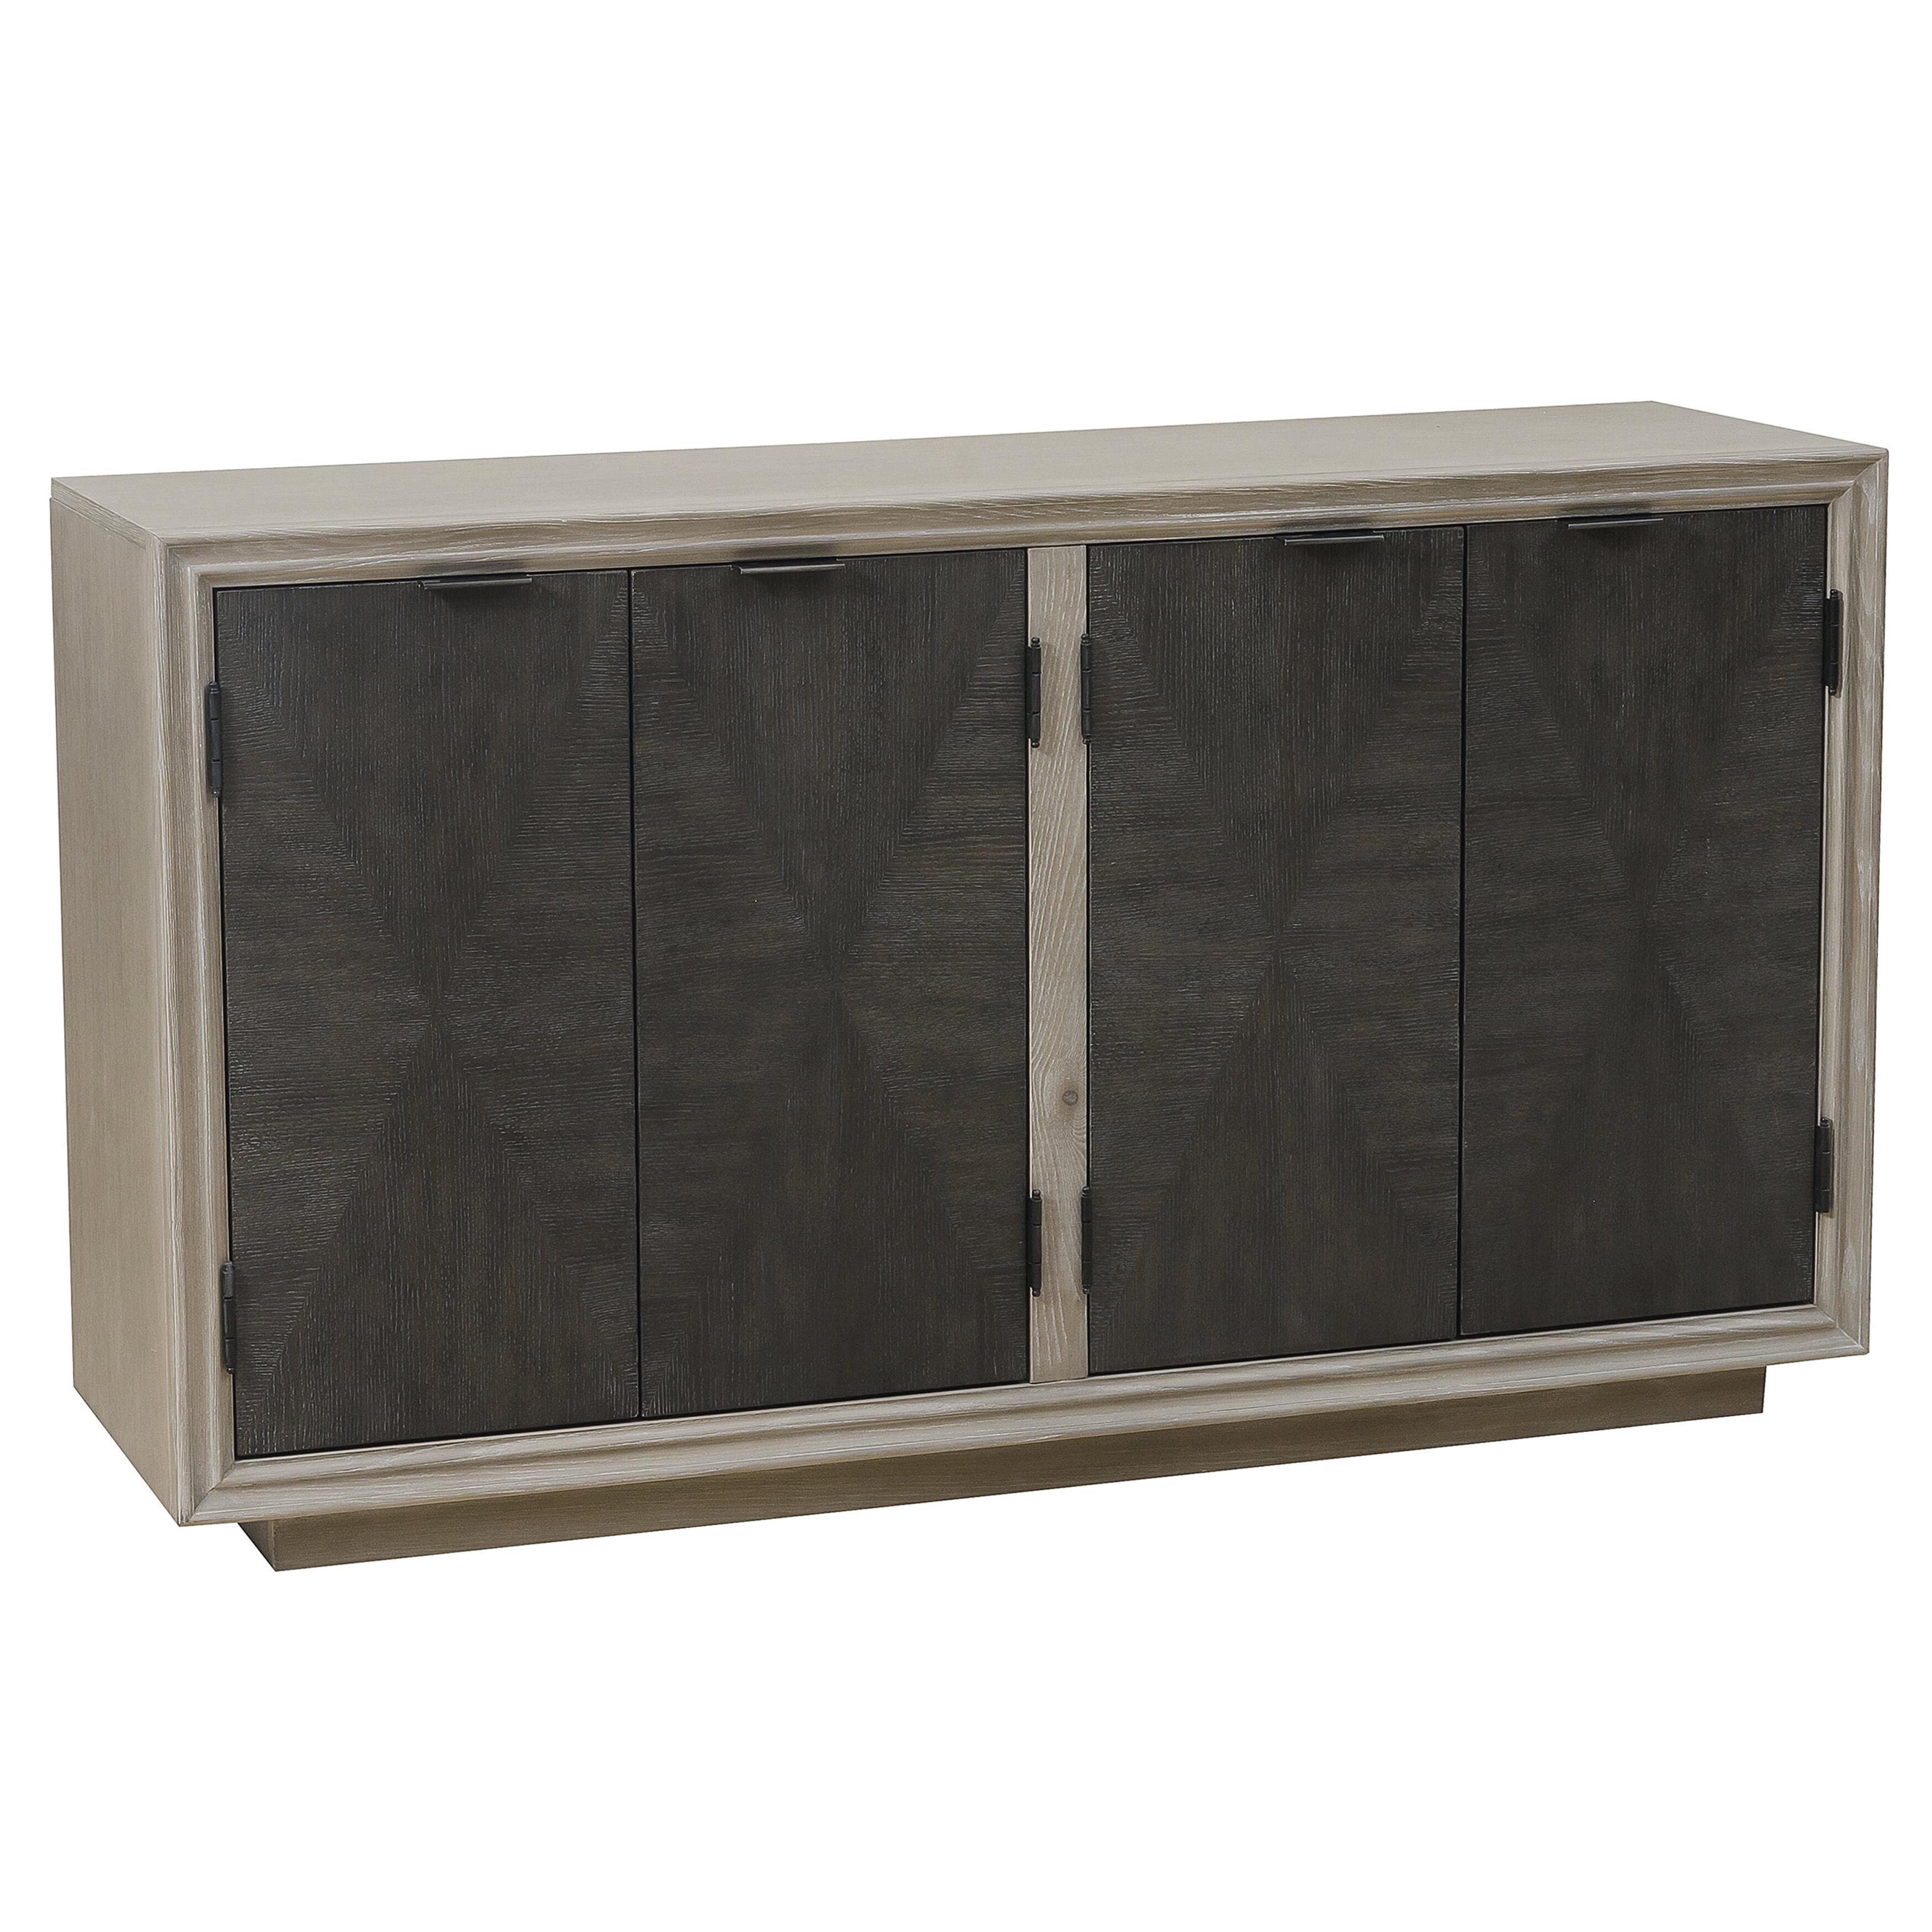 Hoover Four Door Duotone Parquet Sideboard Regarding Massillon Sideboards (View 14 of 20)